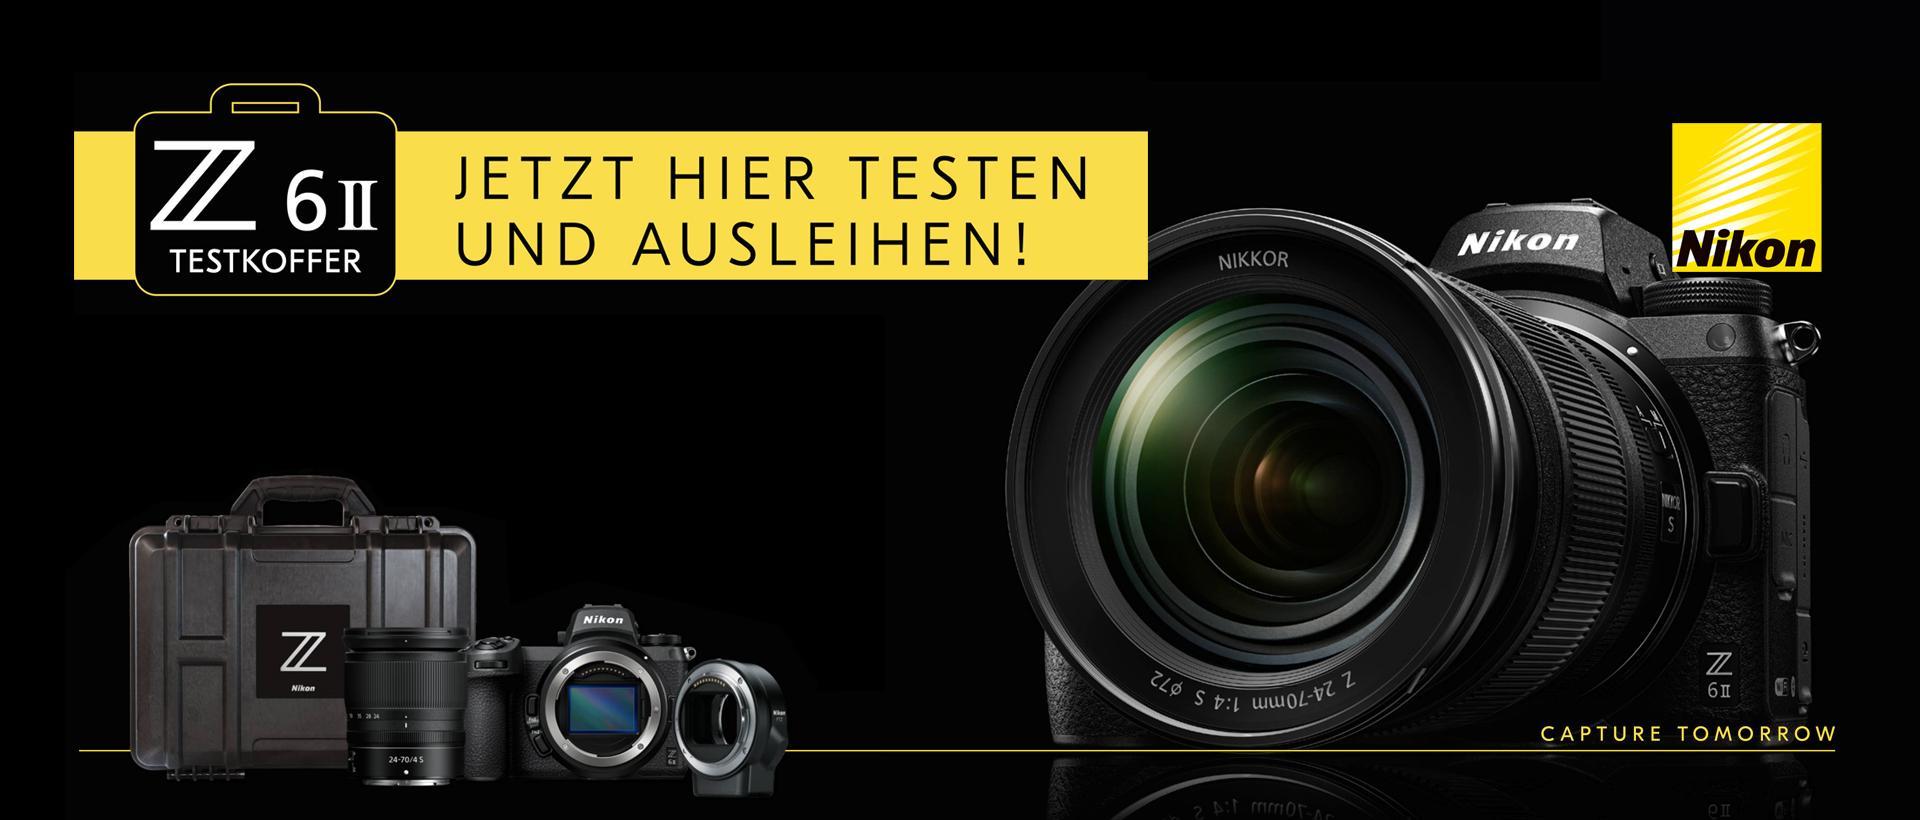 Nikon Z6 II Experience Kit